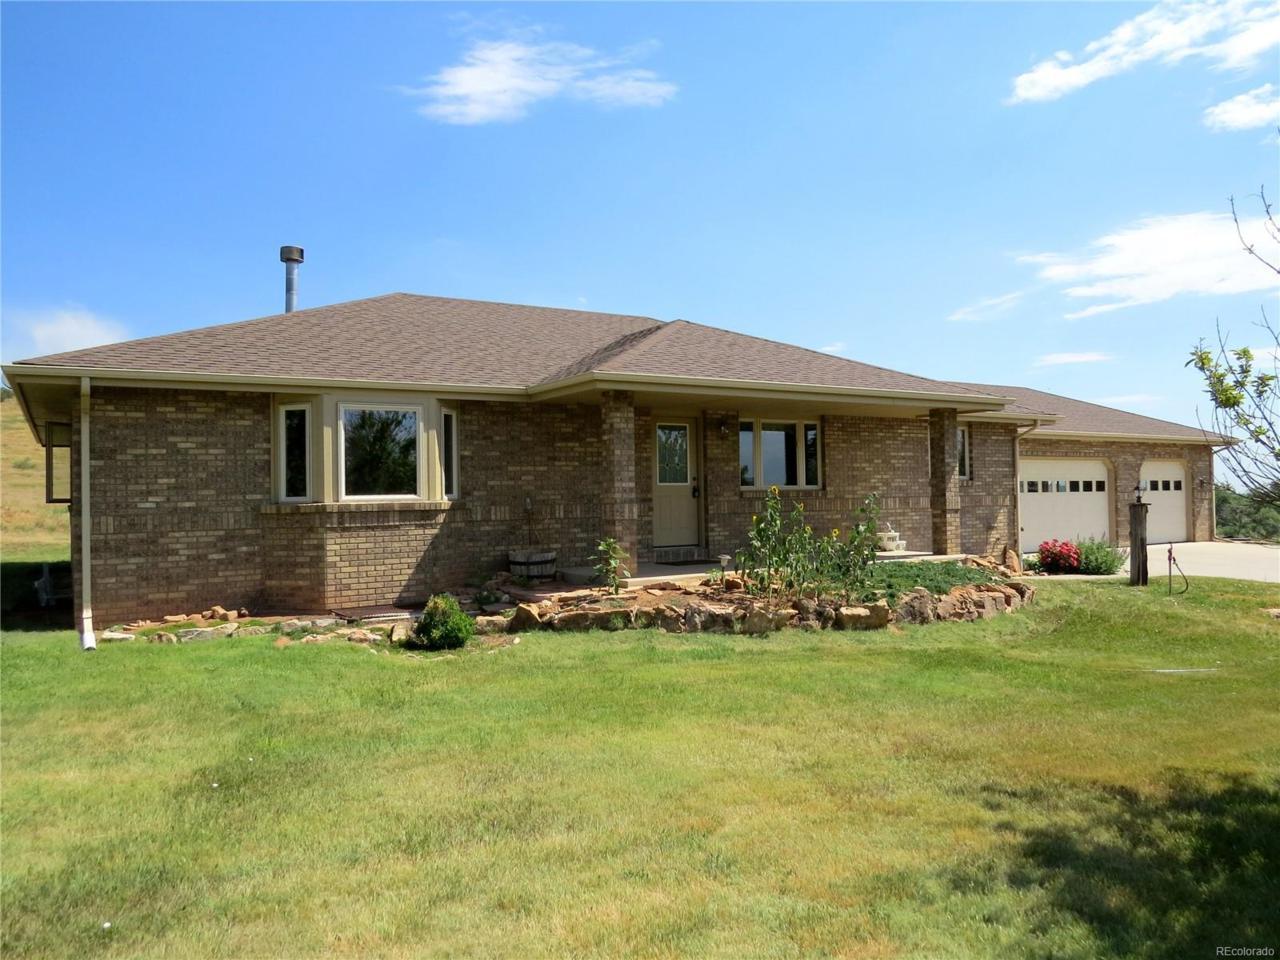 7325 W County Road 20, Loveland, CO 80537 (MLS #3257749) :: 8z Real Estate